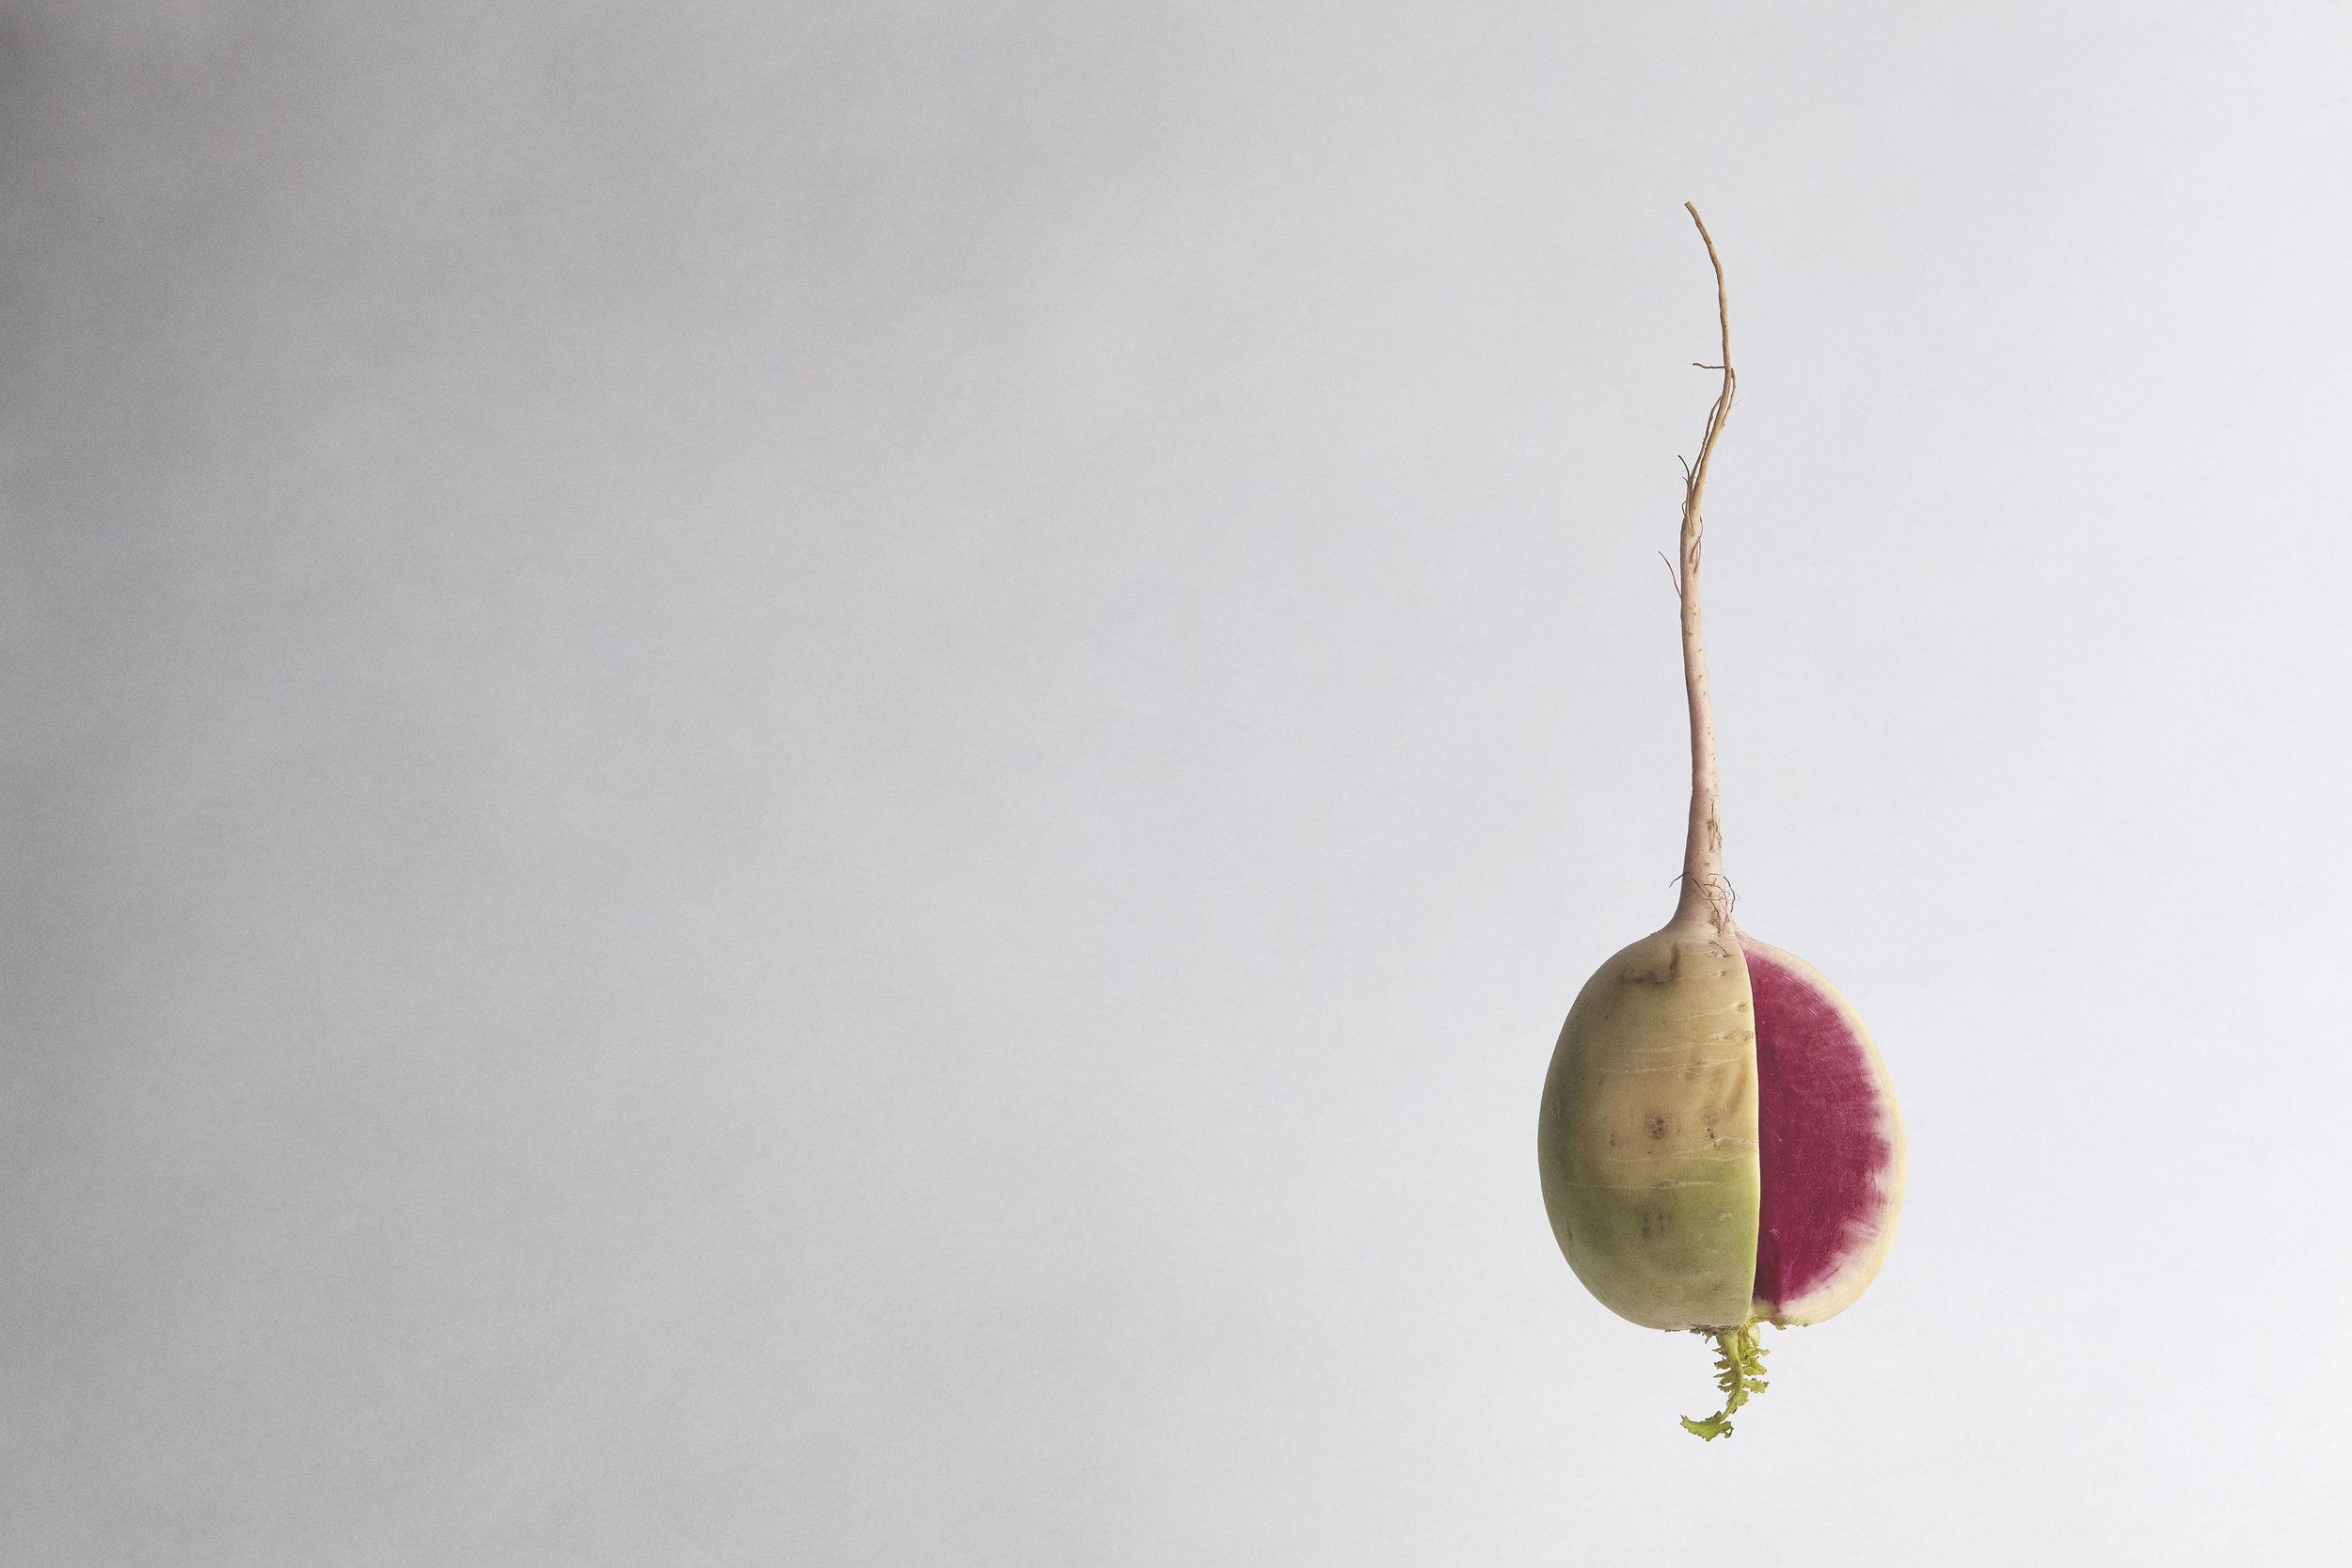 danielle-saler-photography-Watermelon-Radish-6000.jpg